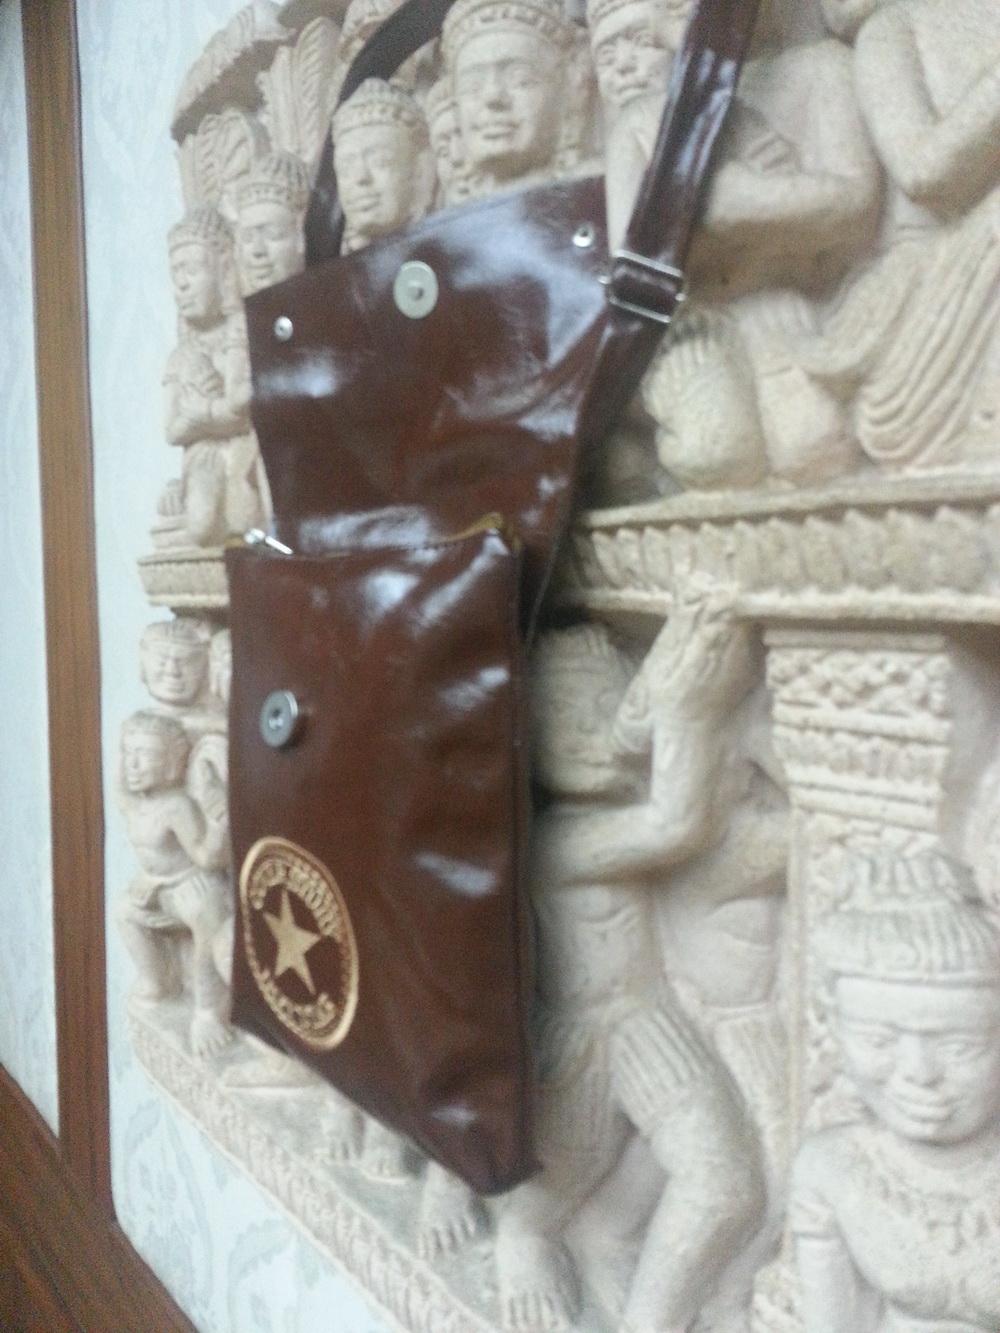 shoulder_messenger_hobo_bag_brown_leatherette_cross_body_cover_story_star_bags_and_backpacks_7.jpg